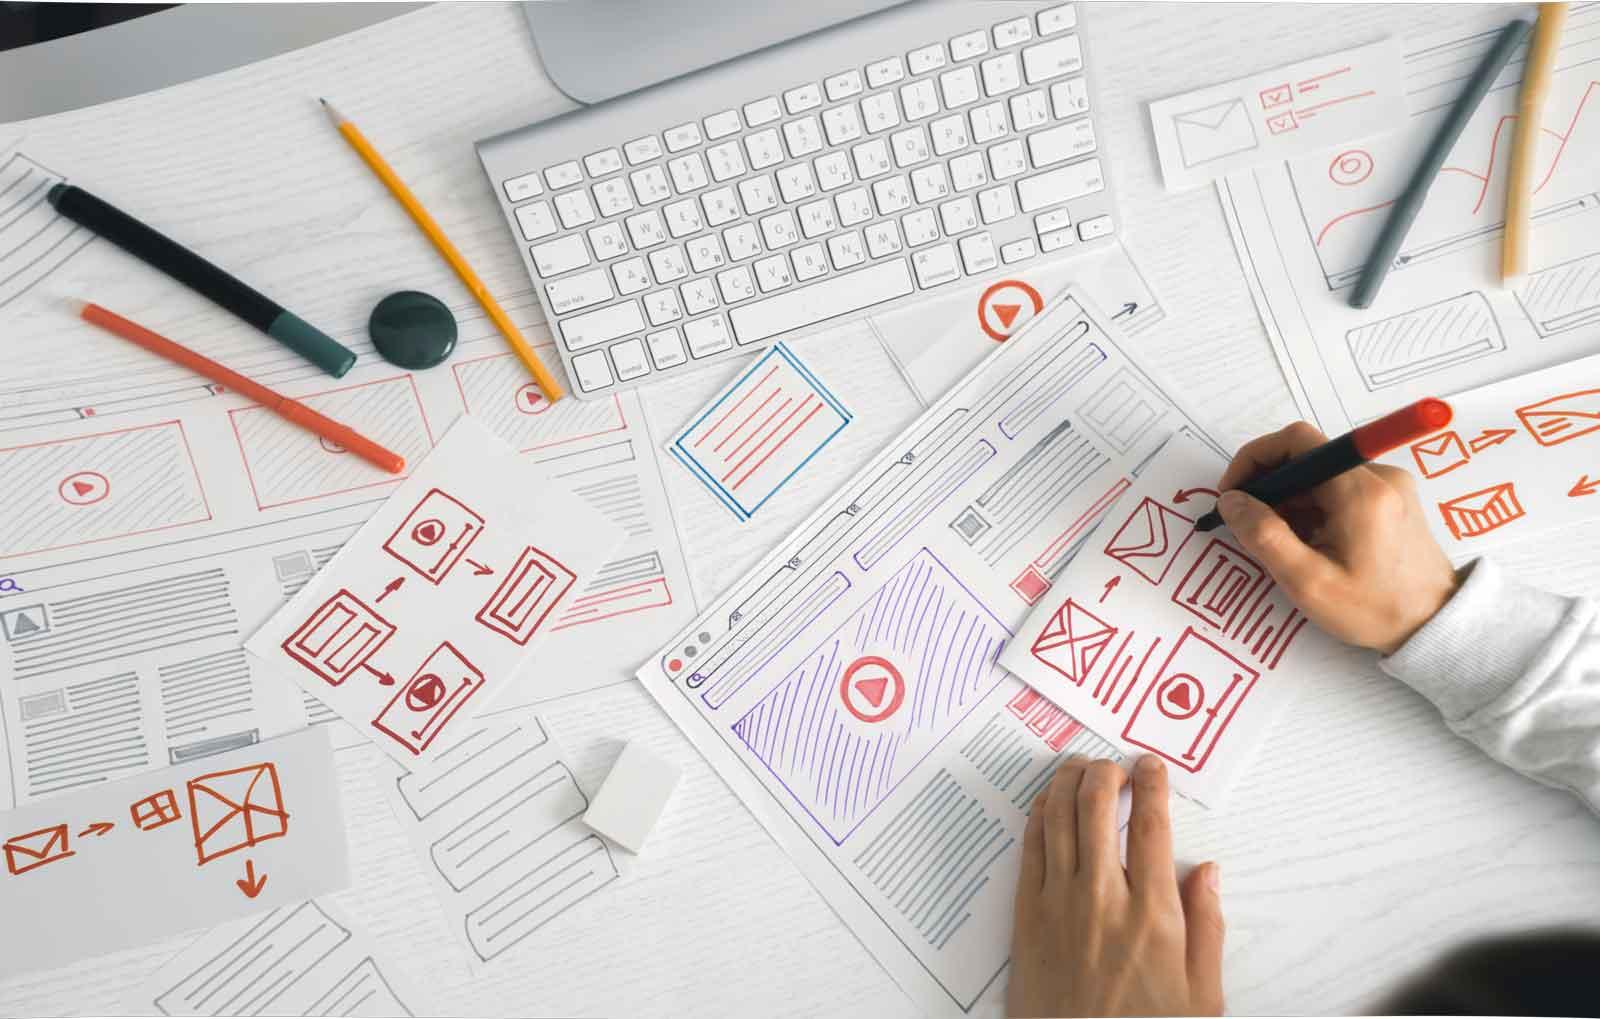 in raise website designer creates sketch application